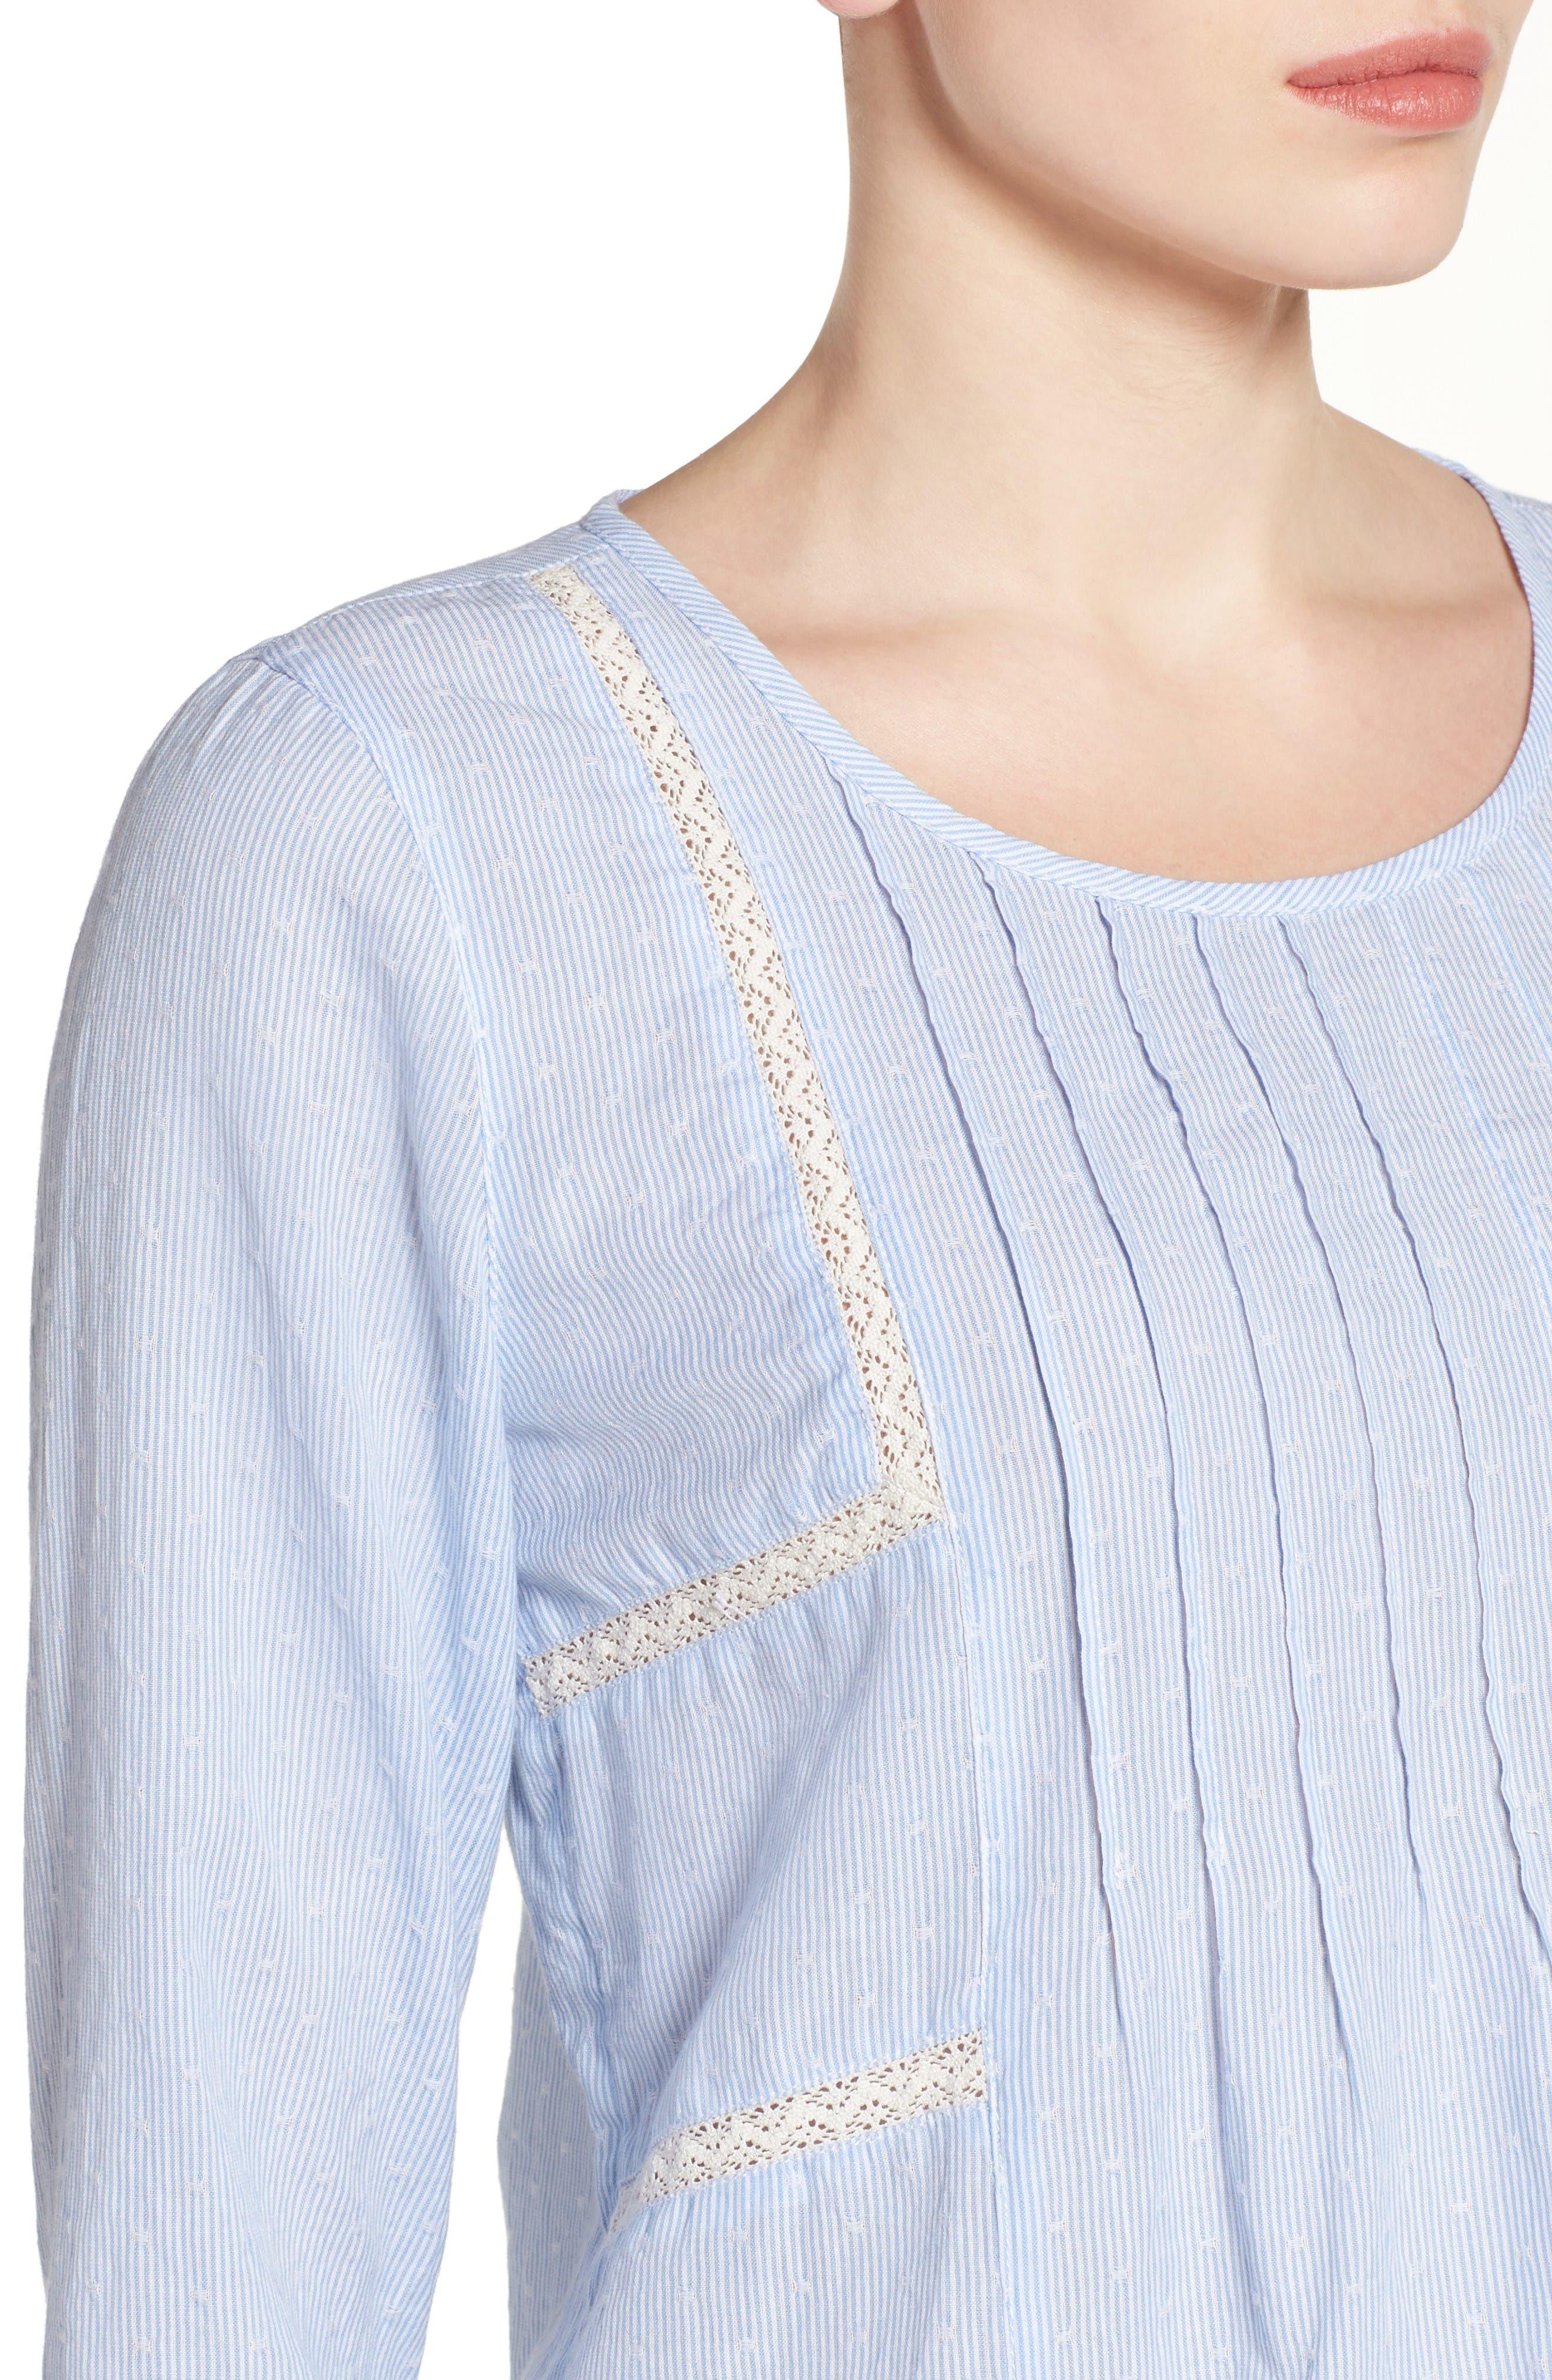 Pintuck Pleat Top,                             Alternate thumbnail 3, color,                             Blue- White Stripe